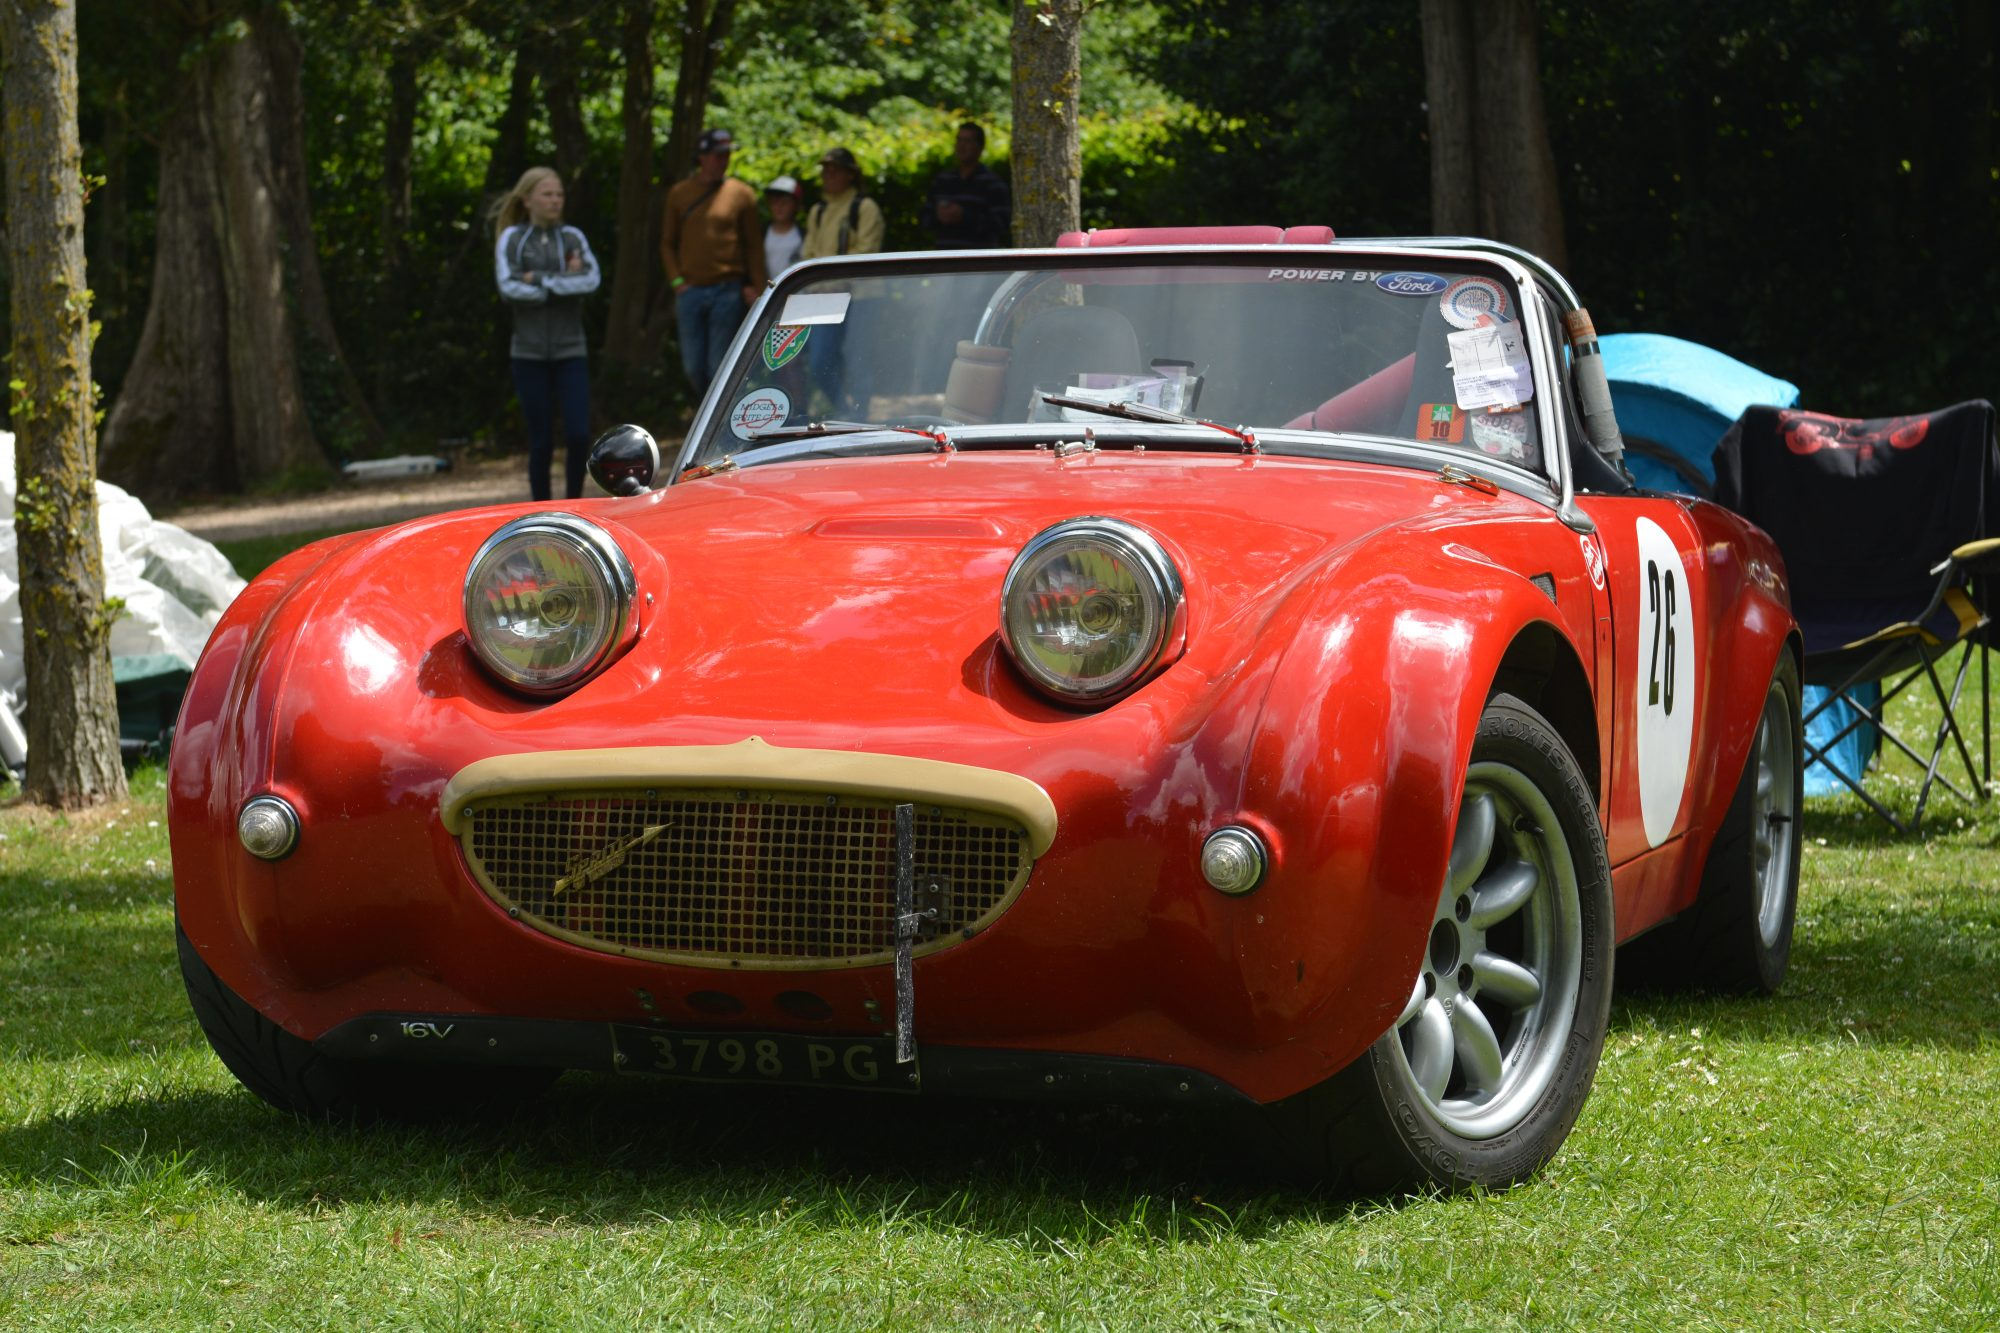 Motorsport, Motorsport at the Palace, Crystal Palace, London car show, classic car, show, classic motorsport, TR6, Frogeye Sprite